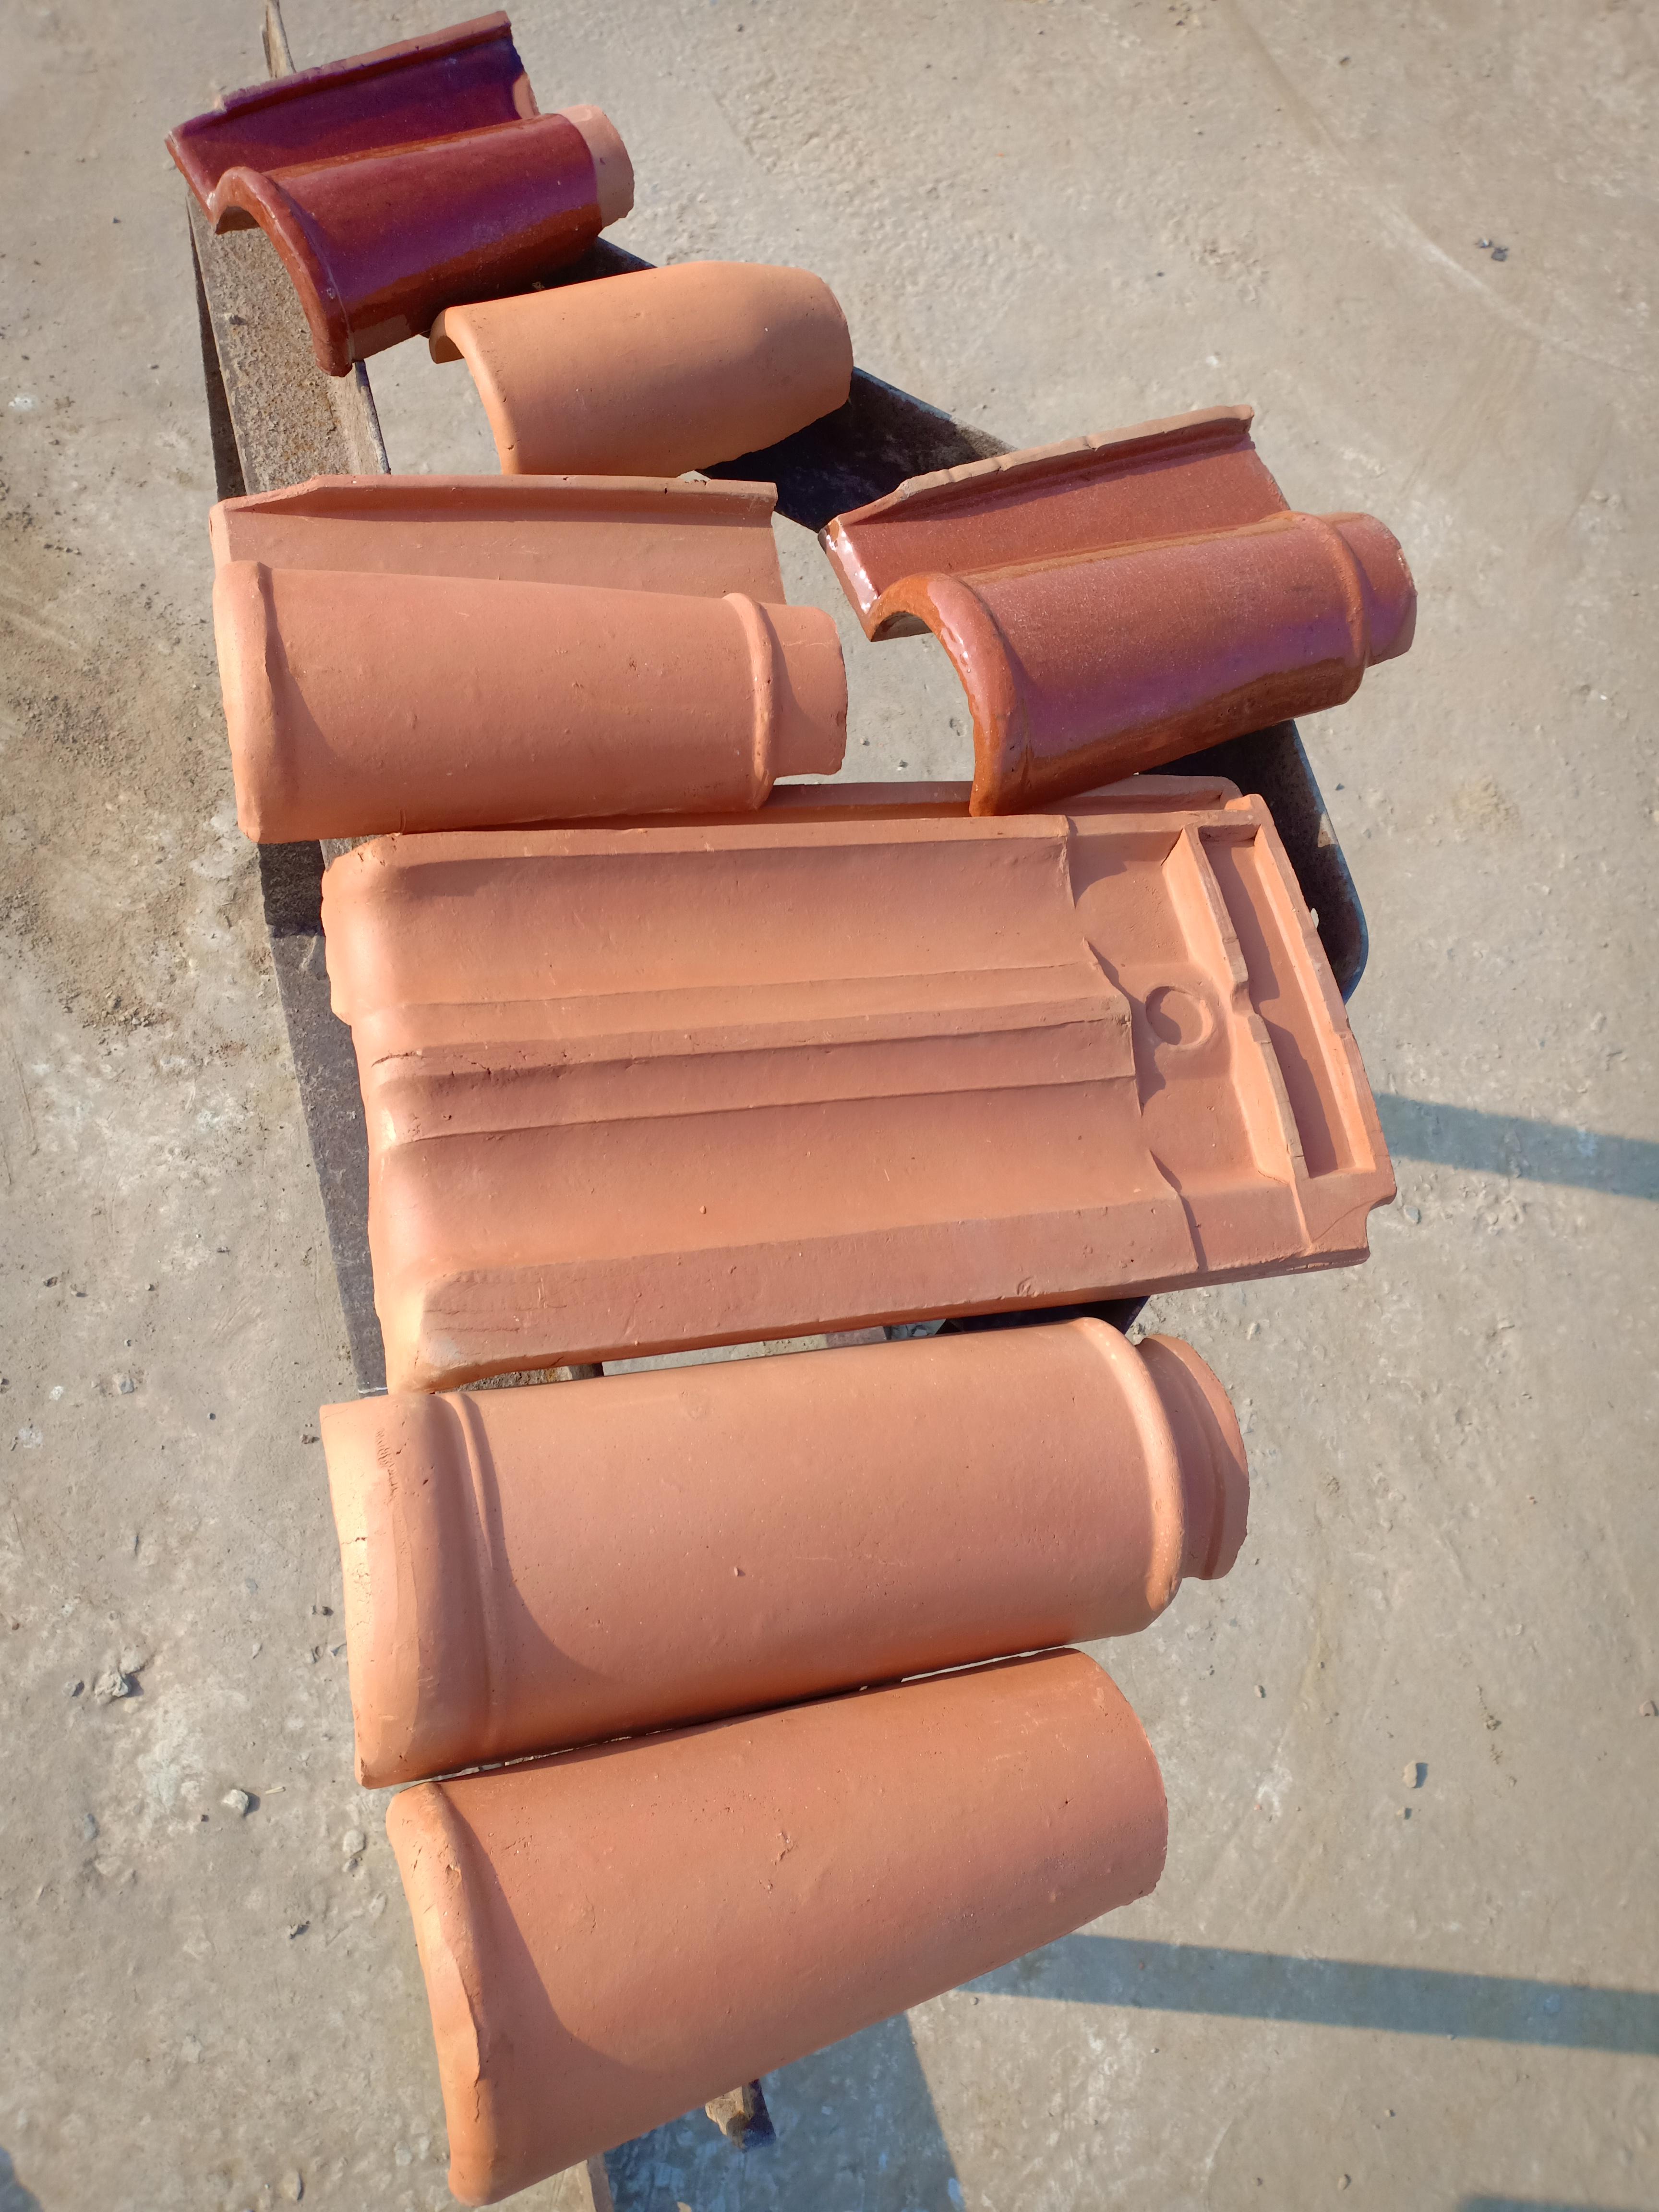 7 Khaprail Tiles Manufacturers Khaprail Tiles in islamabad Rawalpindi Images.